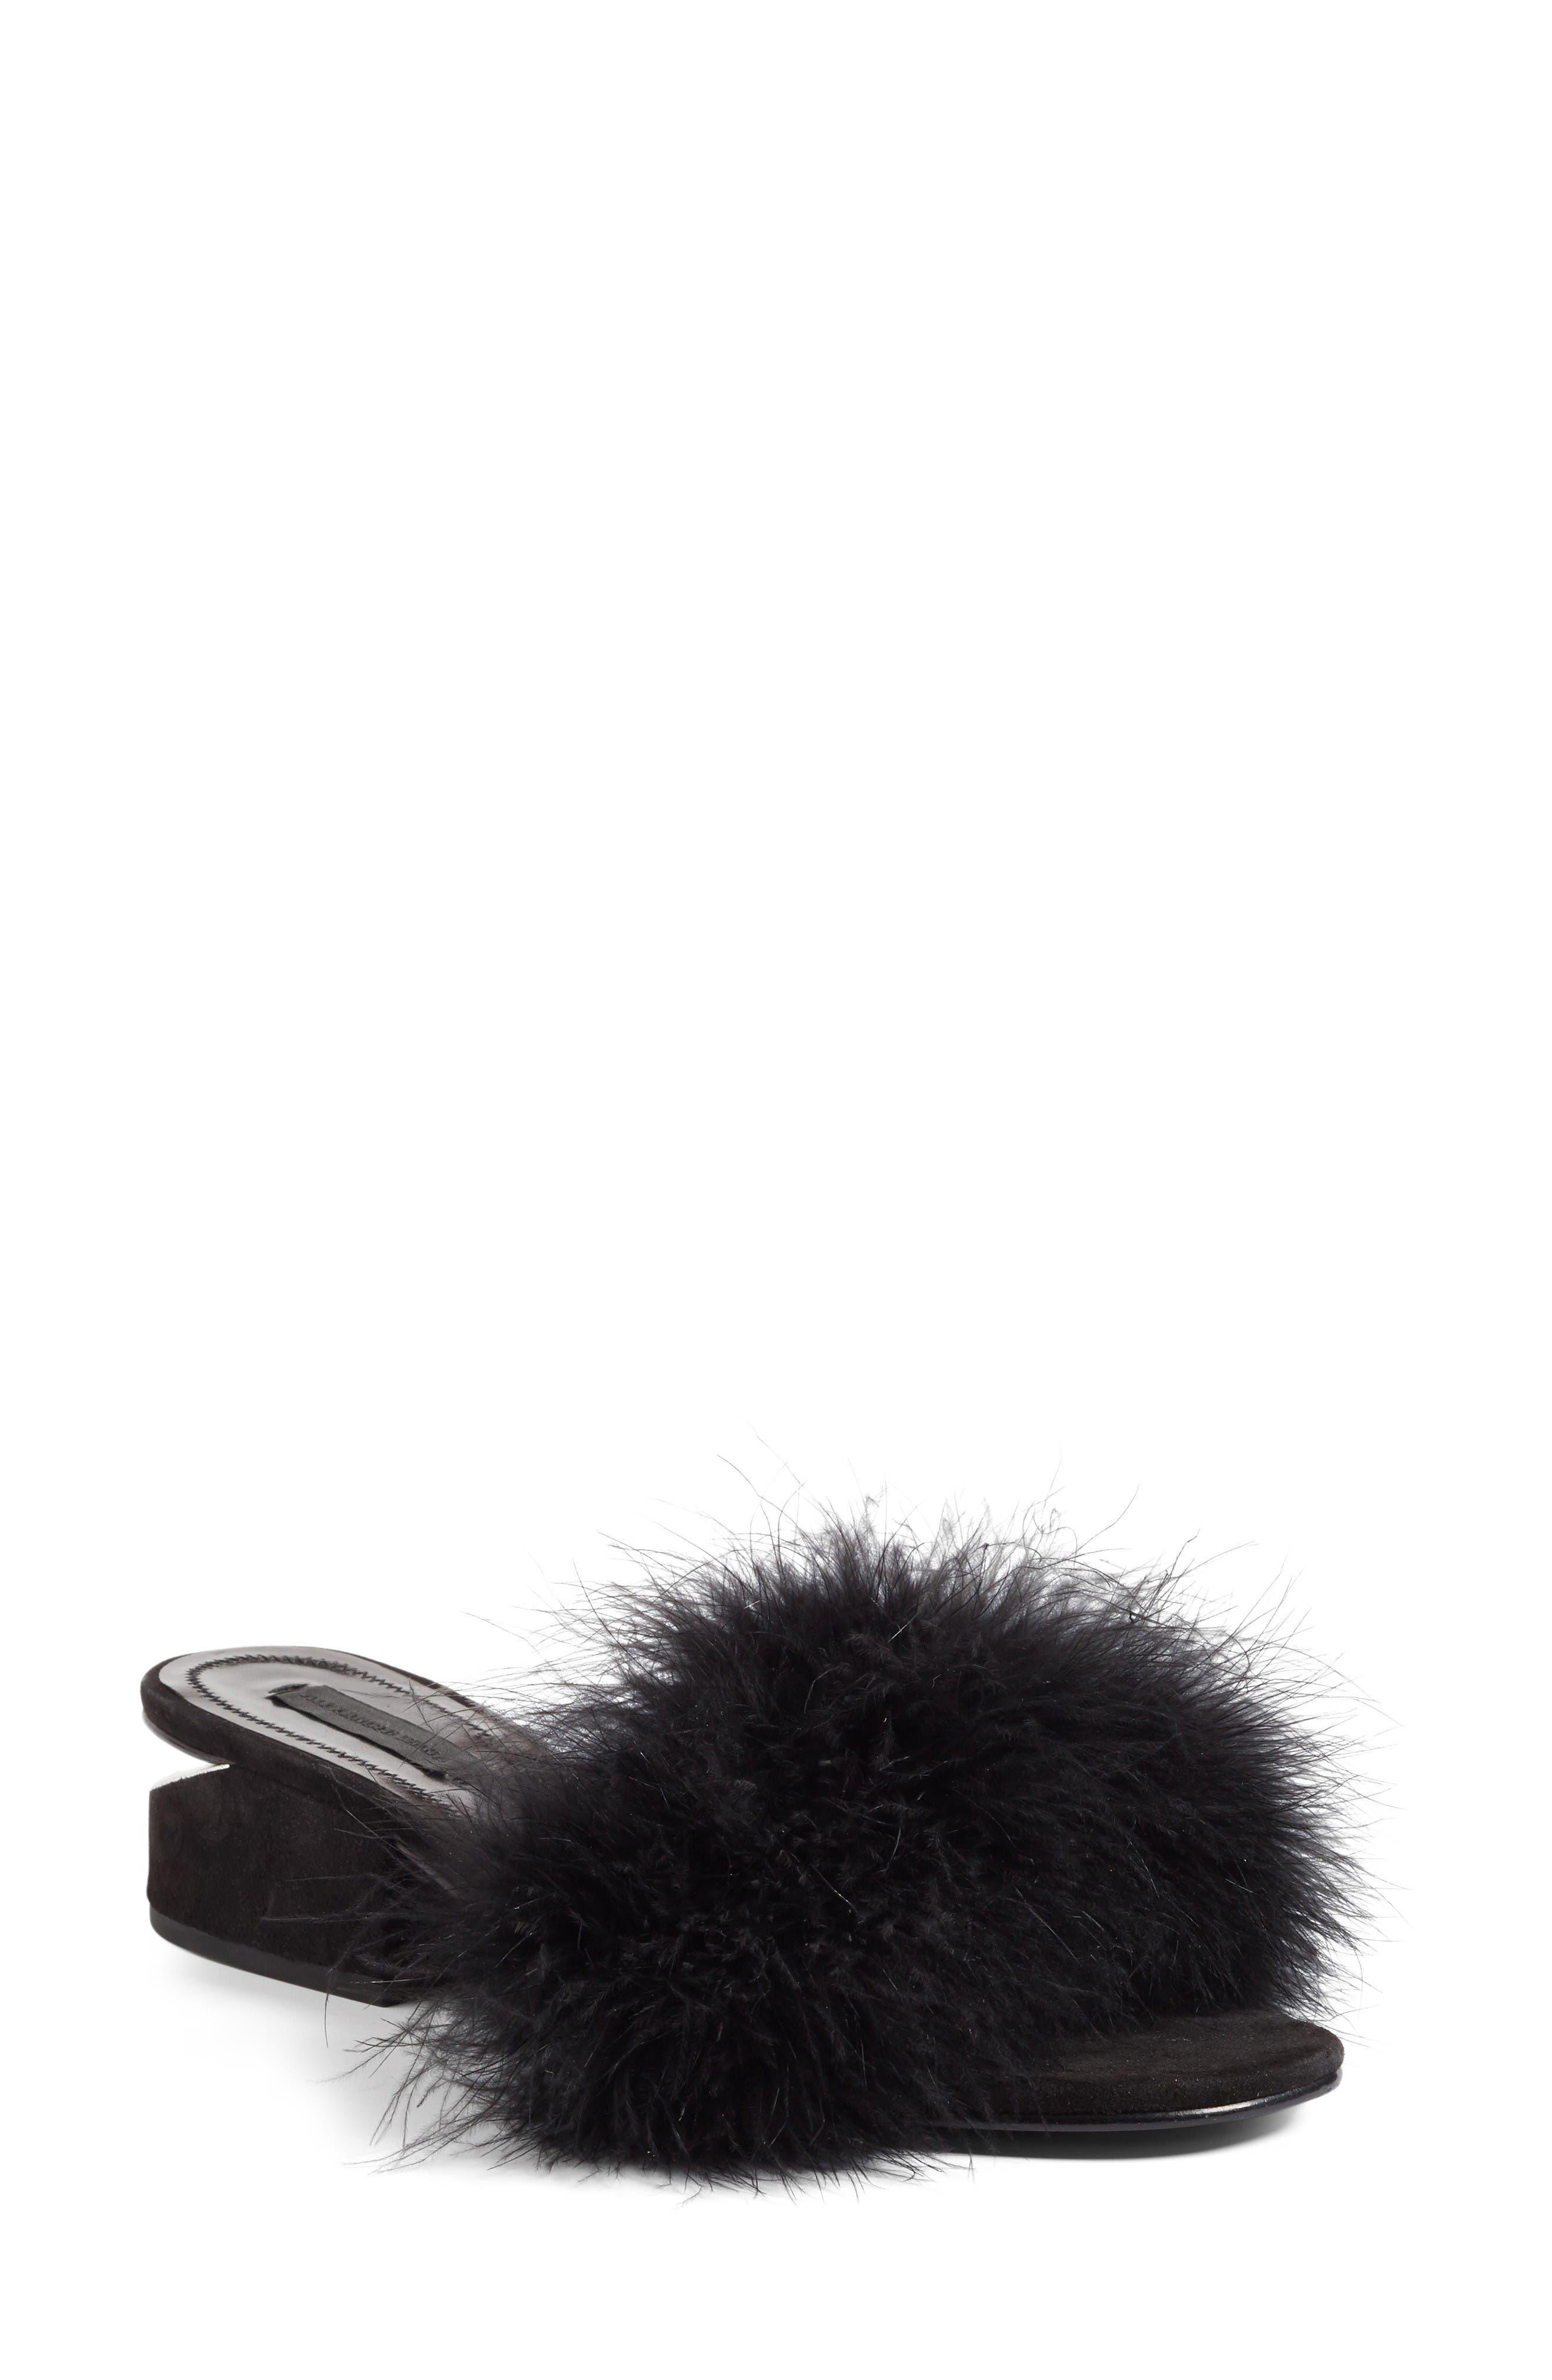 Alternate Image 1 Selected - Alexander Wang Lou Feather Slide Sandal (Women)